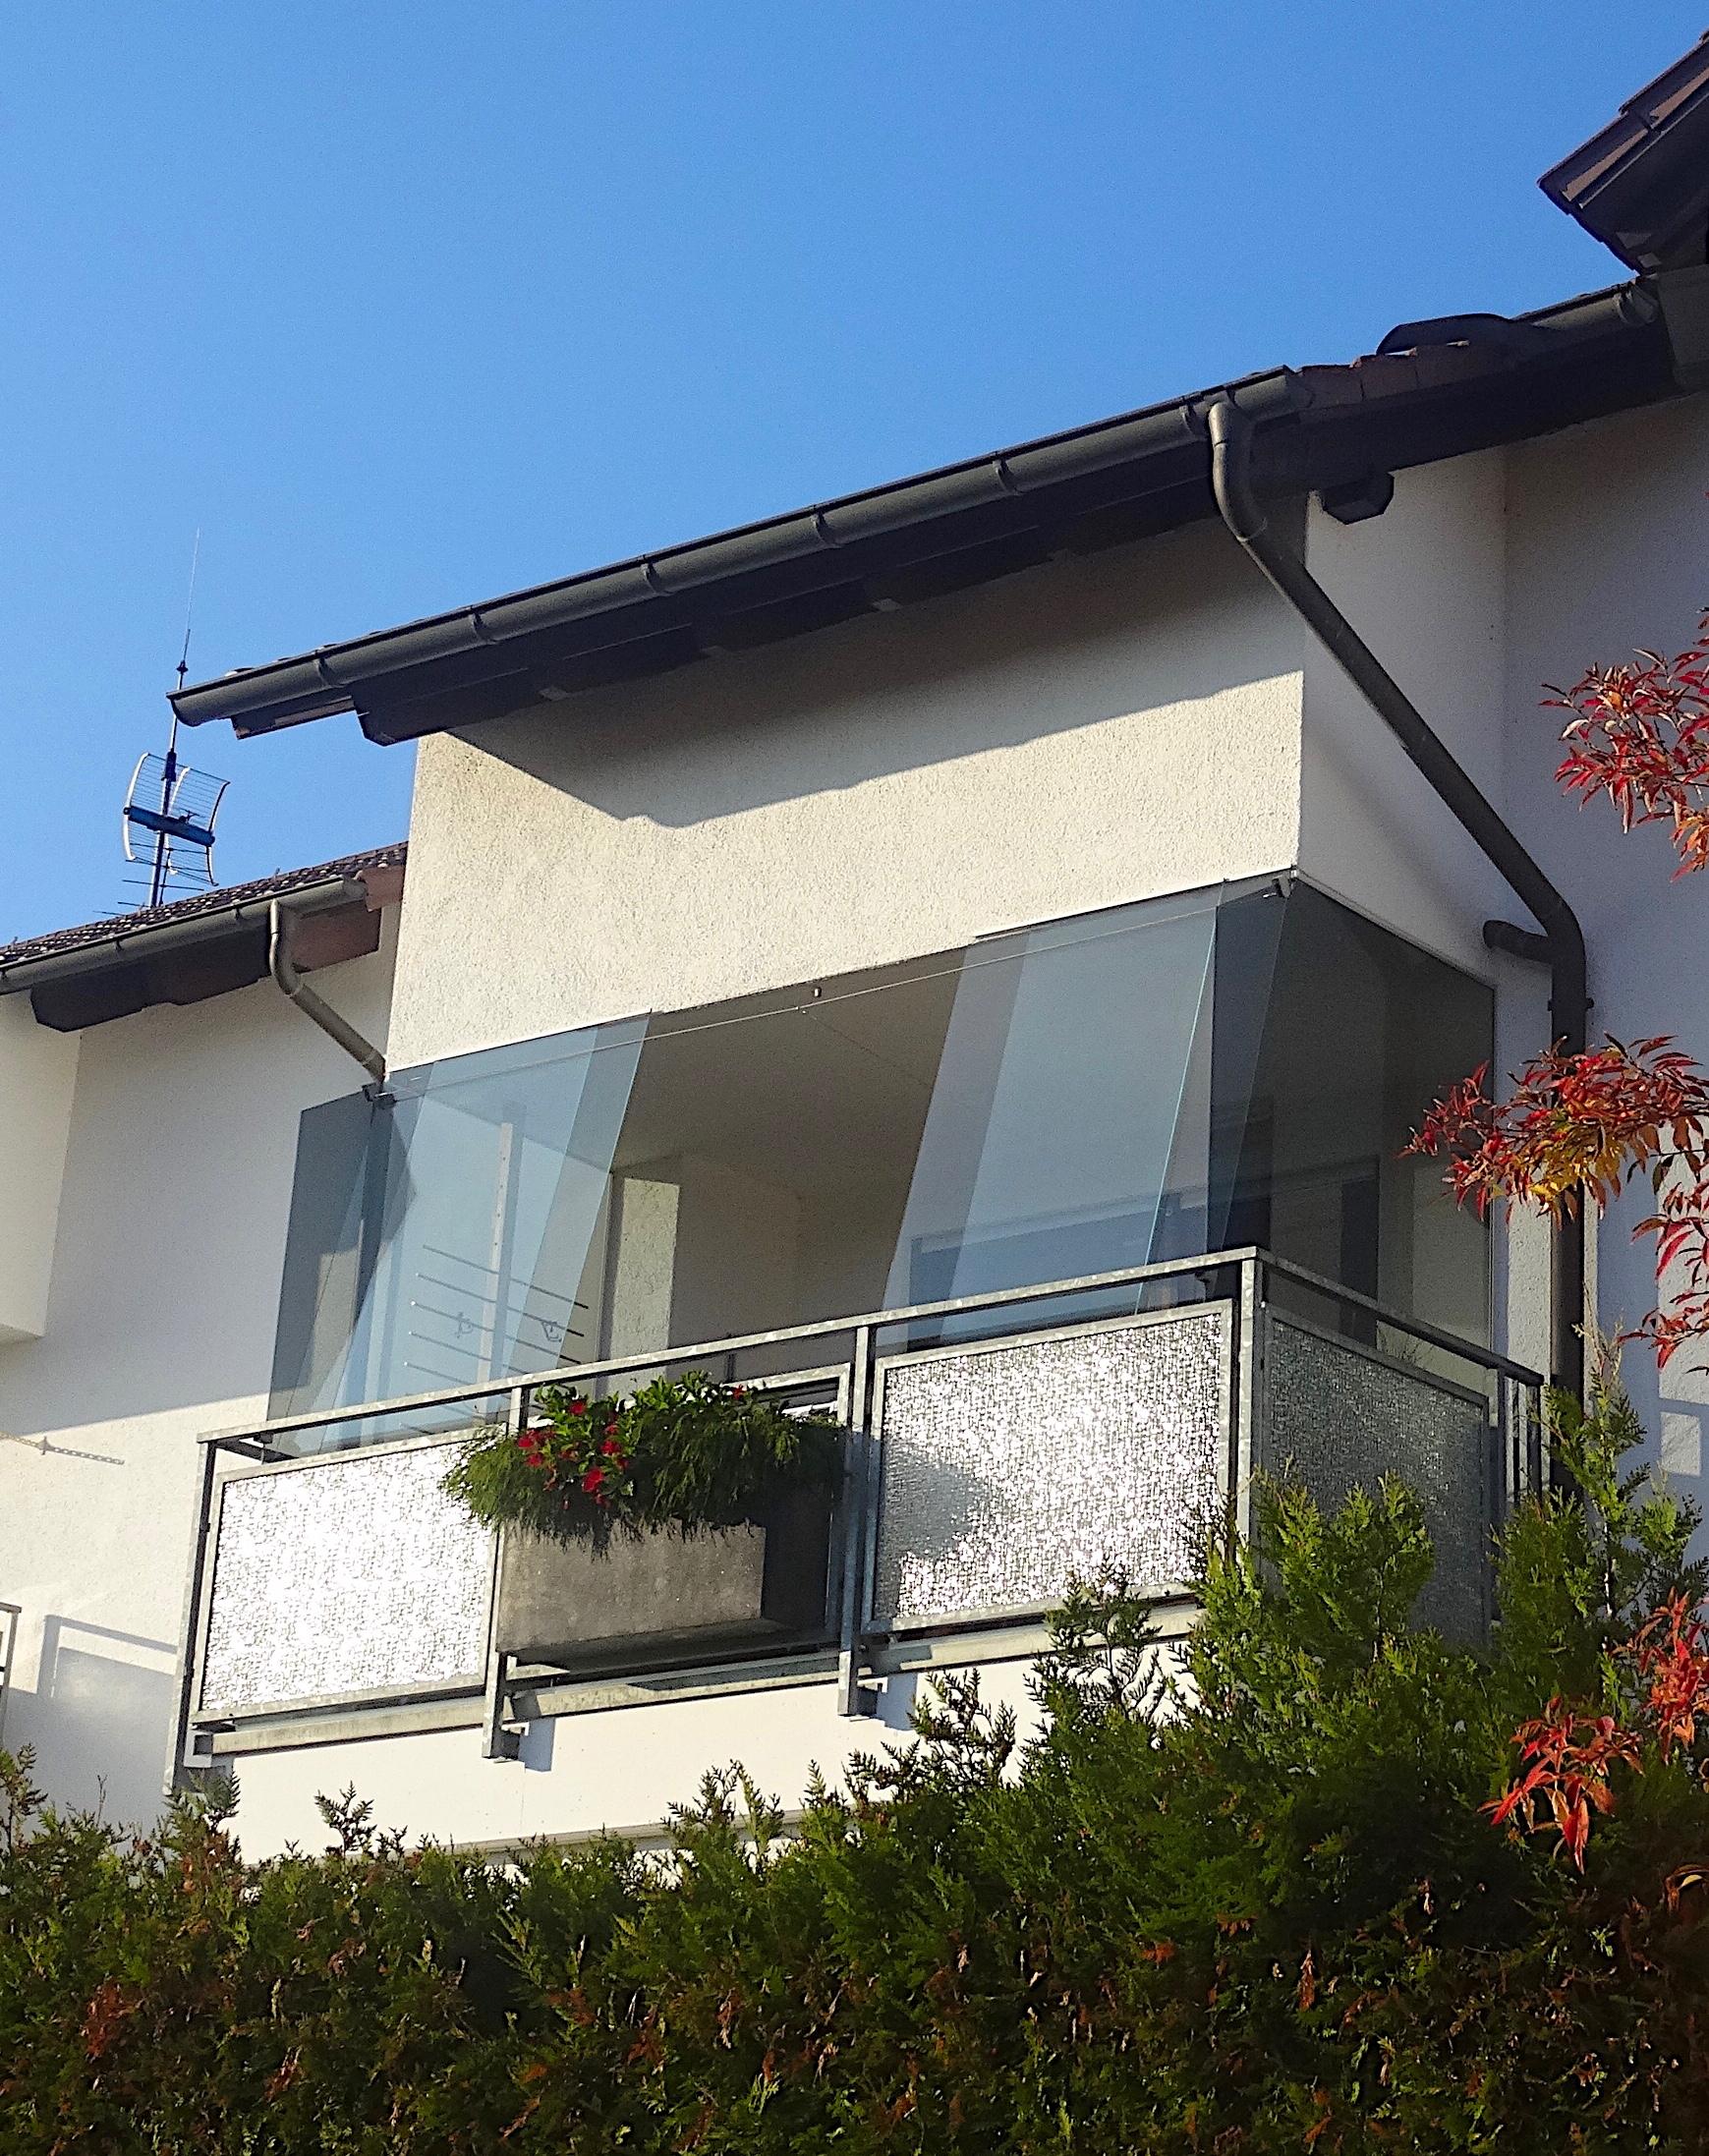 erf14 abnehmbare balkonverglasung cede. Black Bedroom Furniture Sets. Home Design Ideas